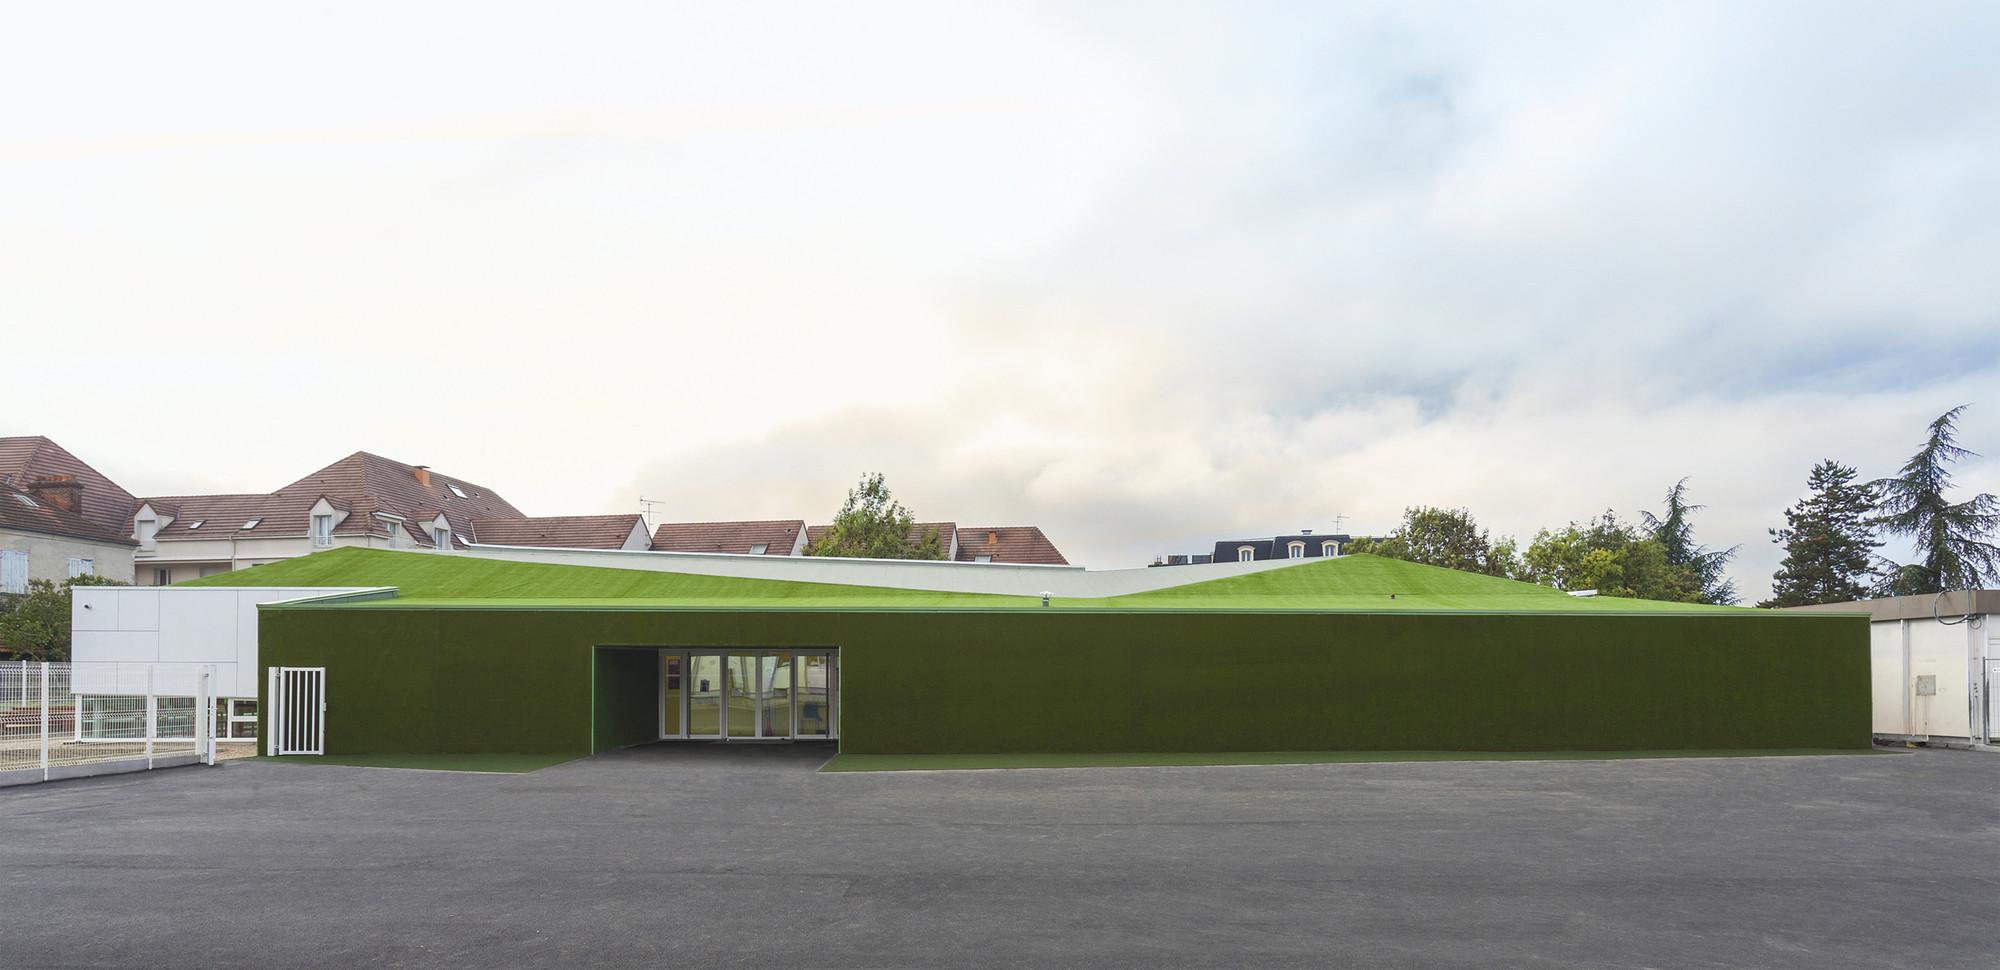 Pajot School Canteen / Atelier 208, © Alexis Leclercq